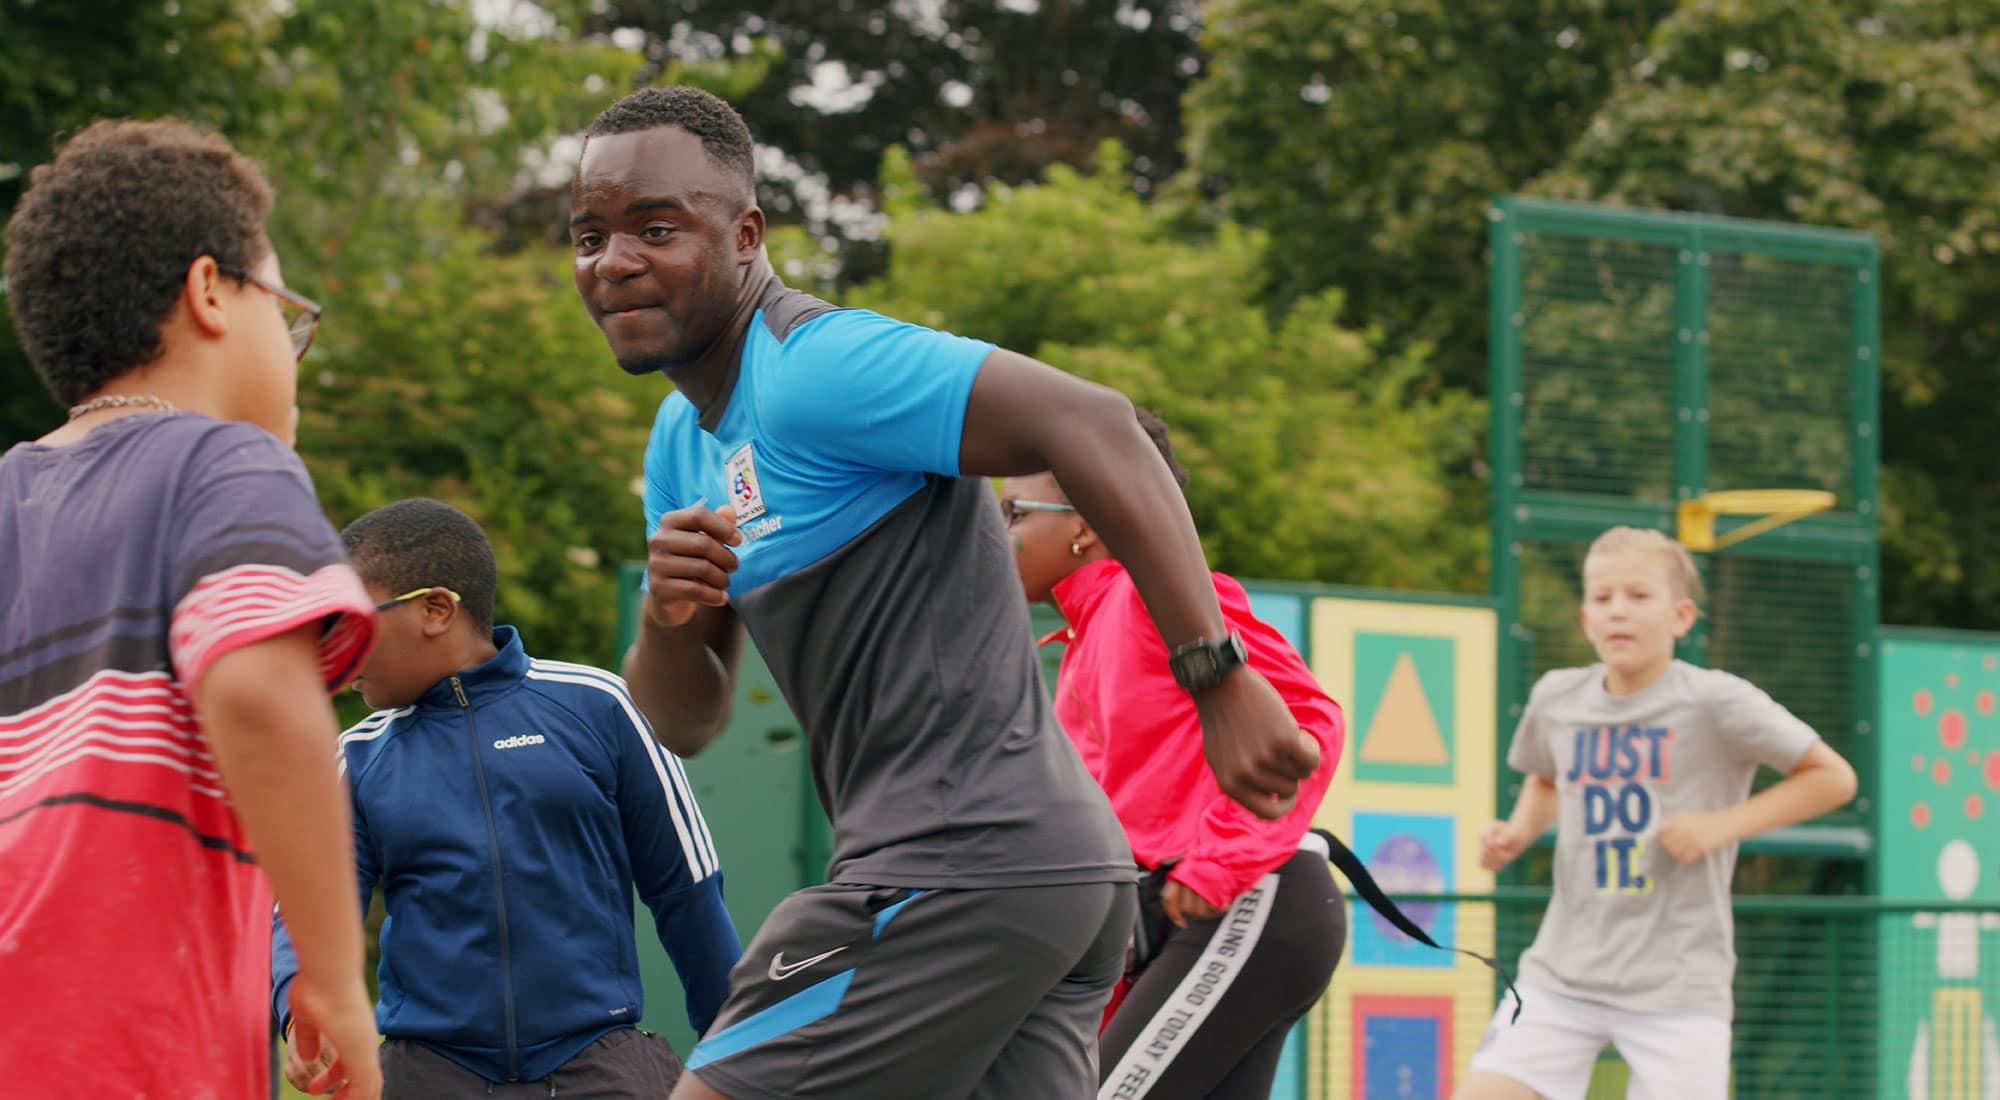 ukactive and Nike announce winner of Active School Hero 2021 for inspiring primary school children to be active